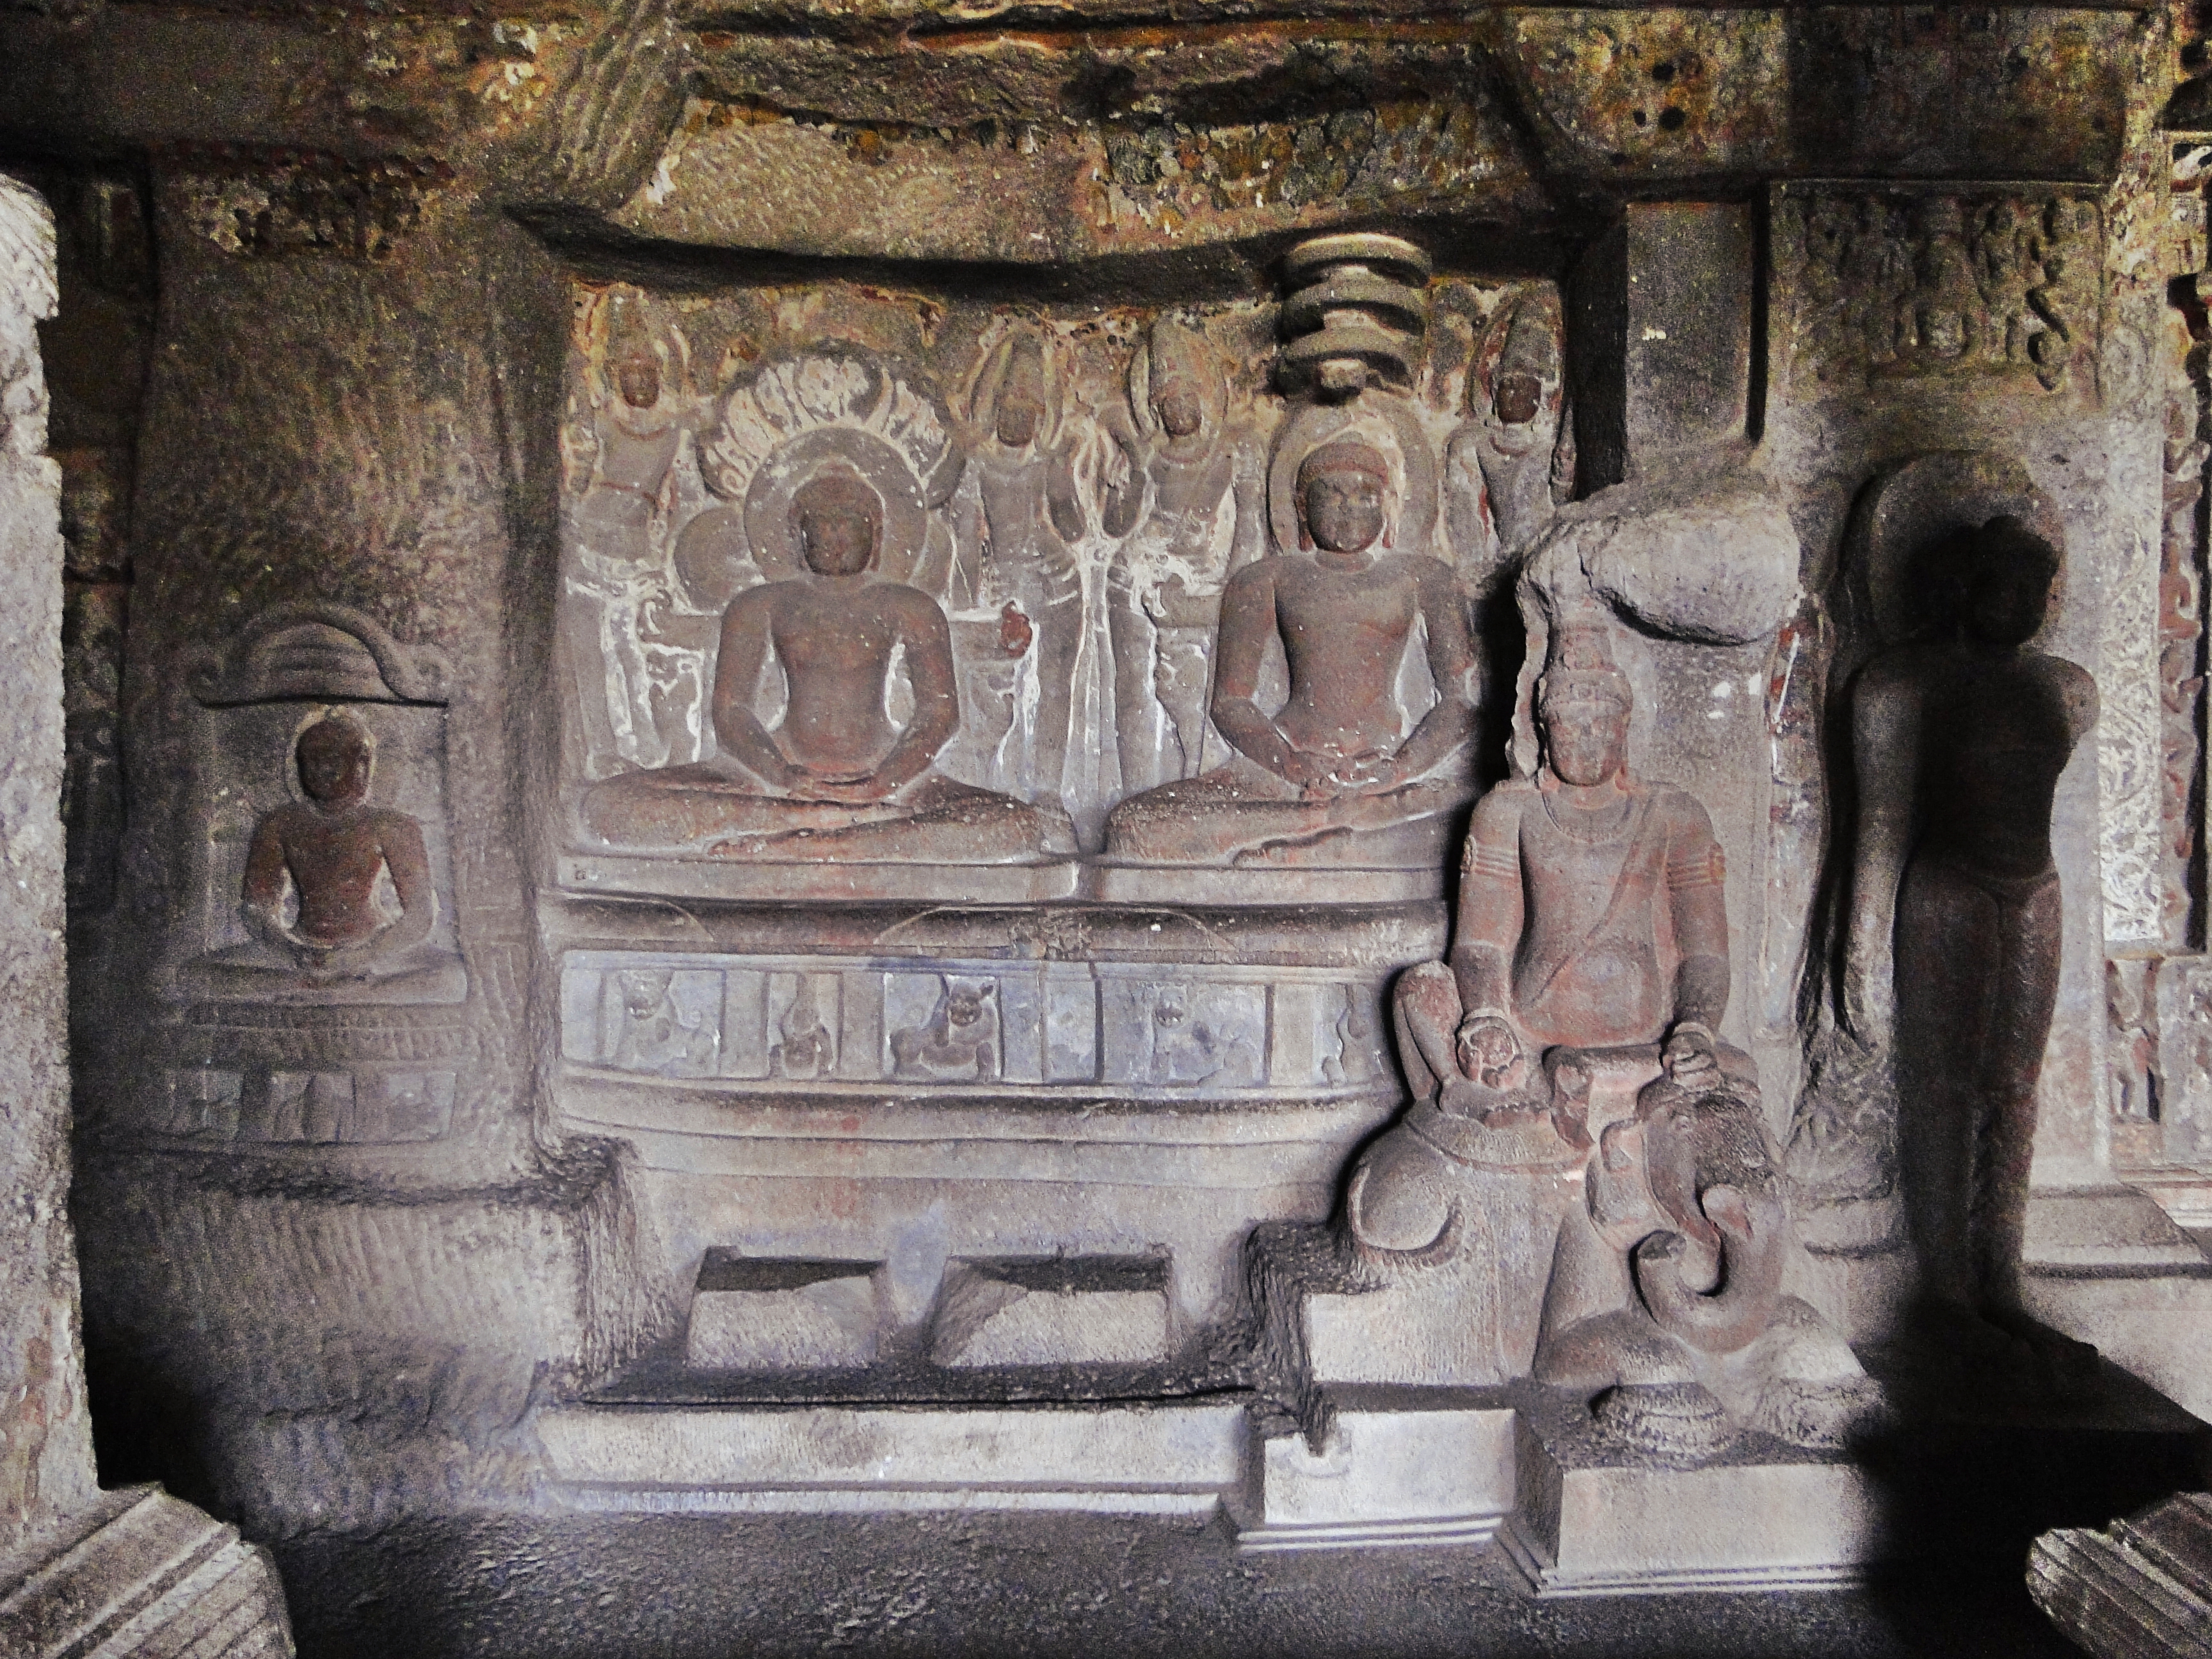 File:Jain Tirthankars, Cave No. 34, Ellora Caves.jpg - Wikimedia Commons